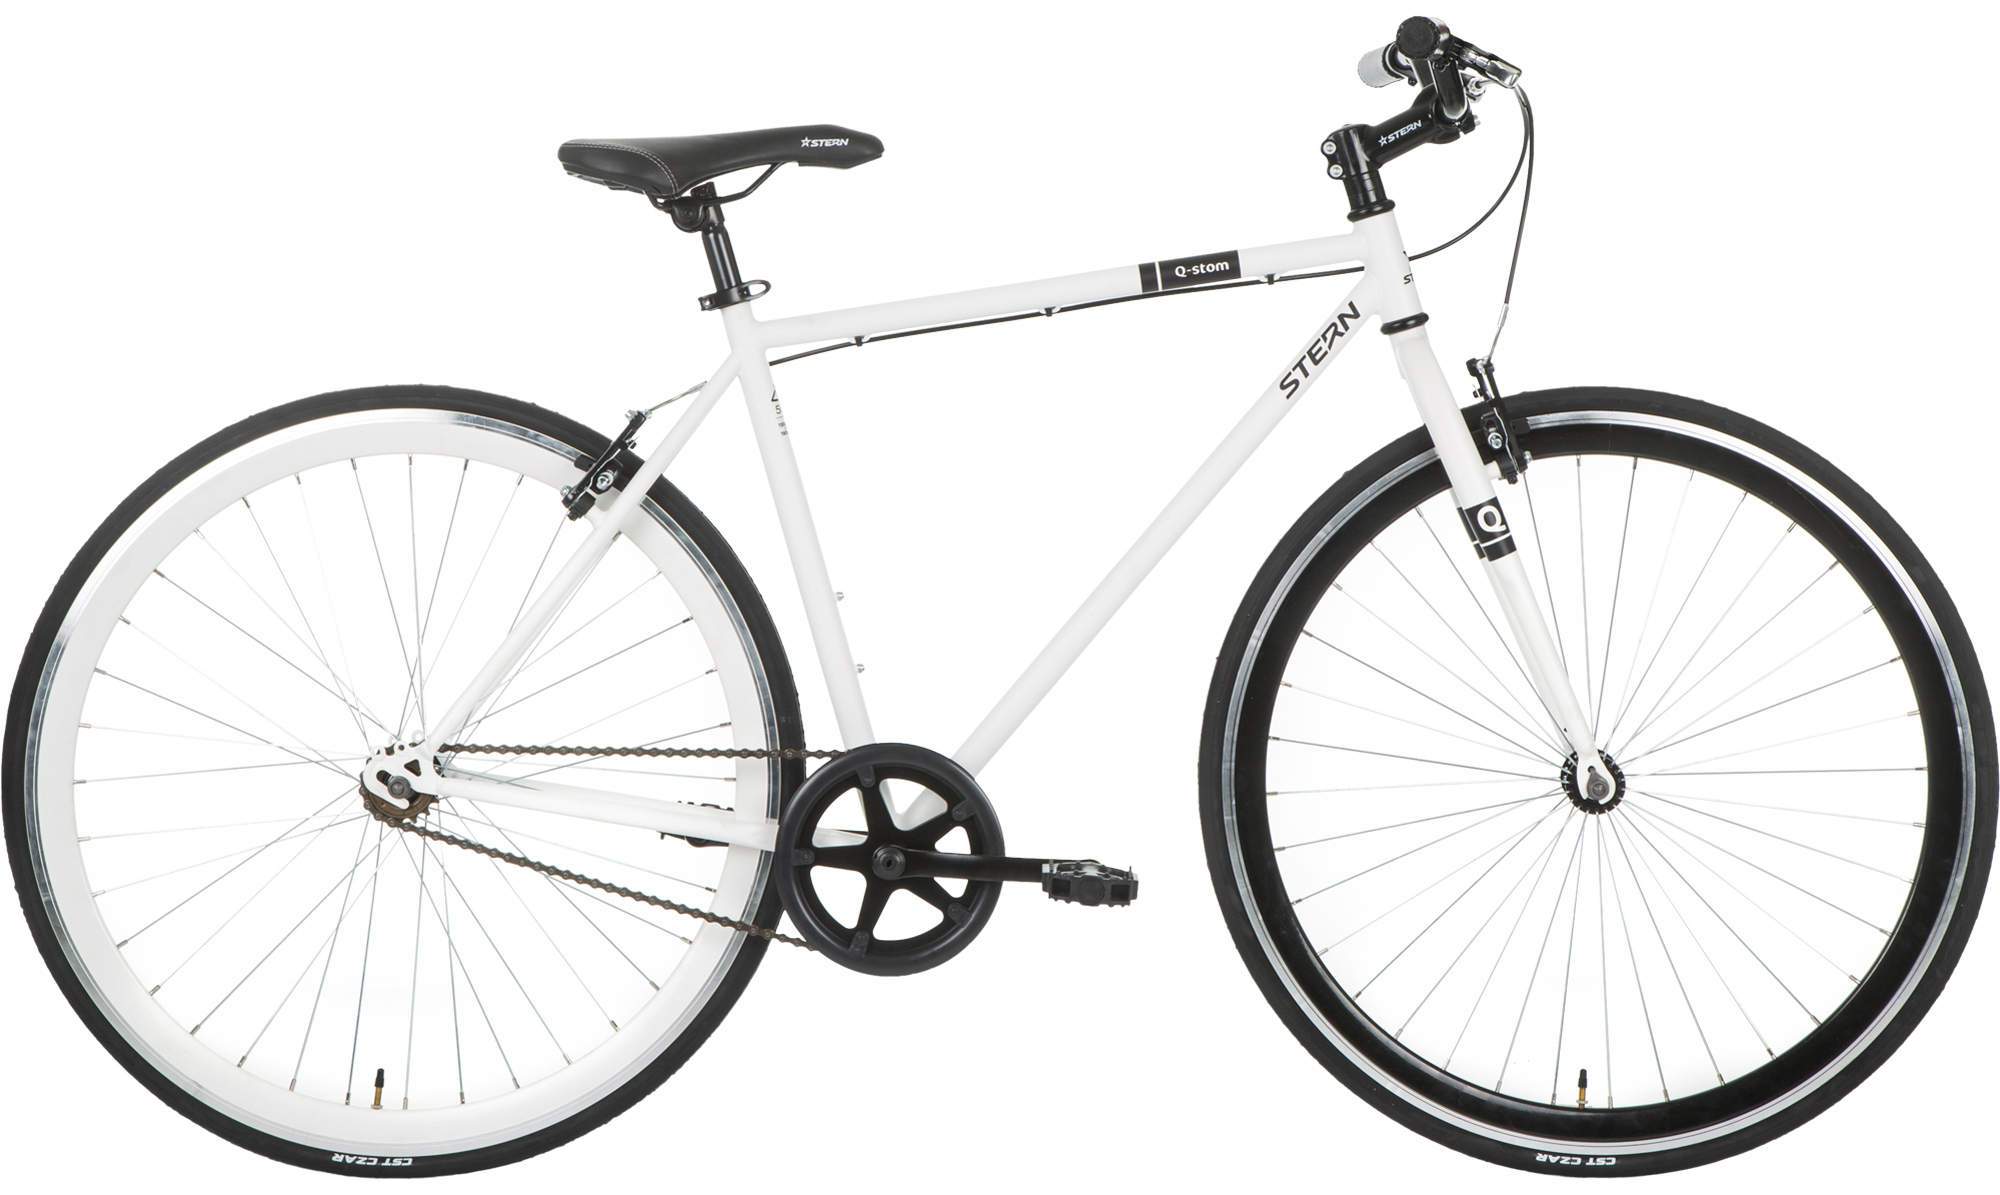 цена на Stern Велосипед городской Stern Q-stom alt 28